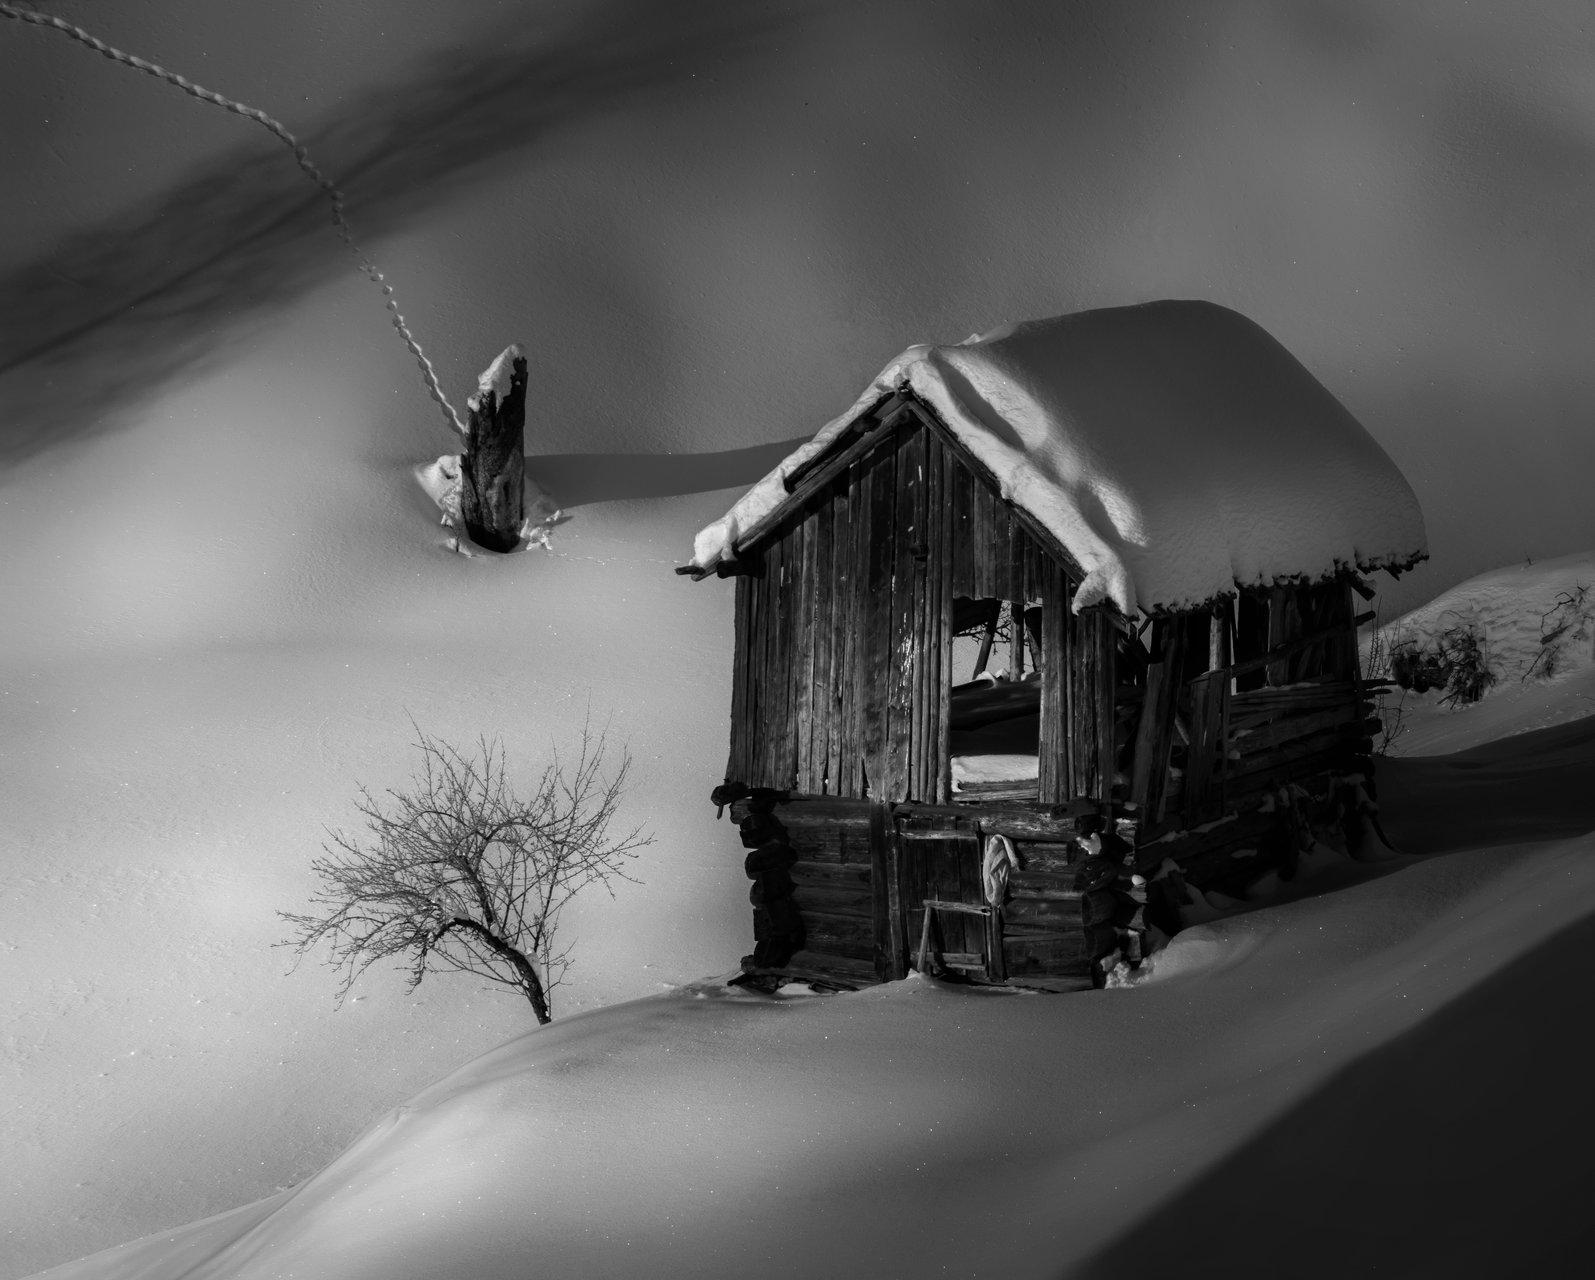 Родопска зима от Miroslav Mominski - Miroslav_Mominski